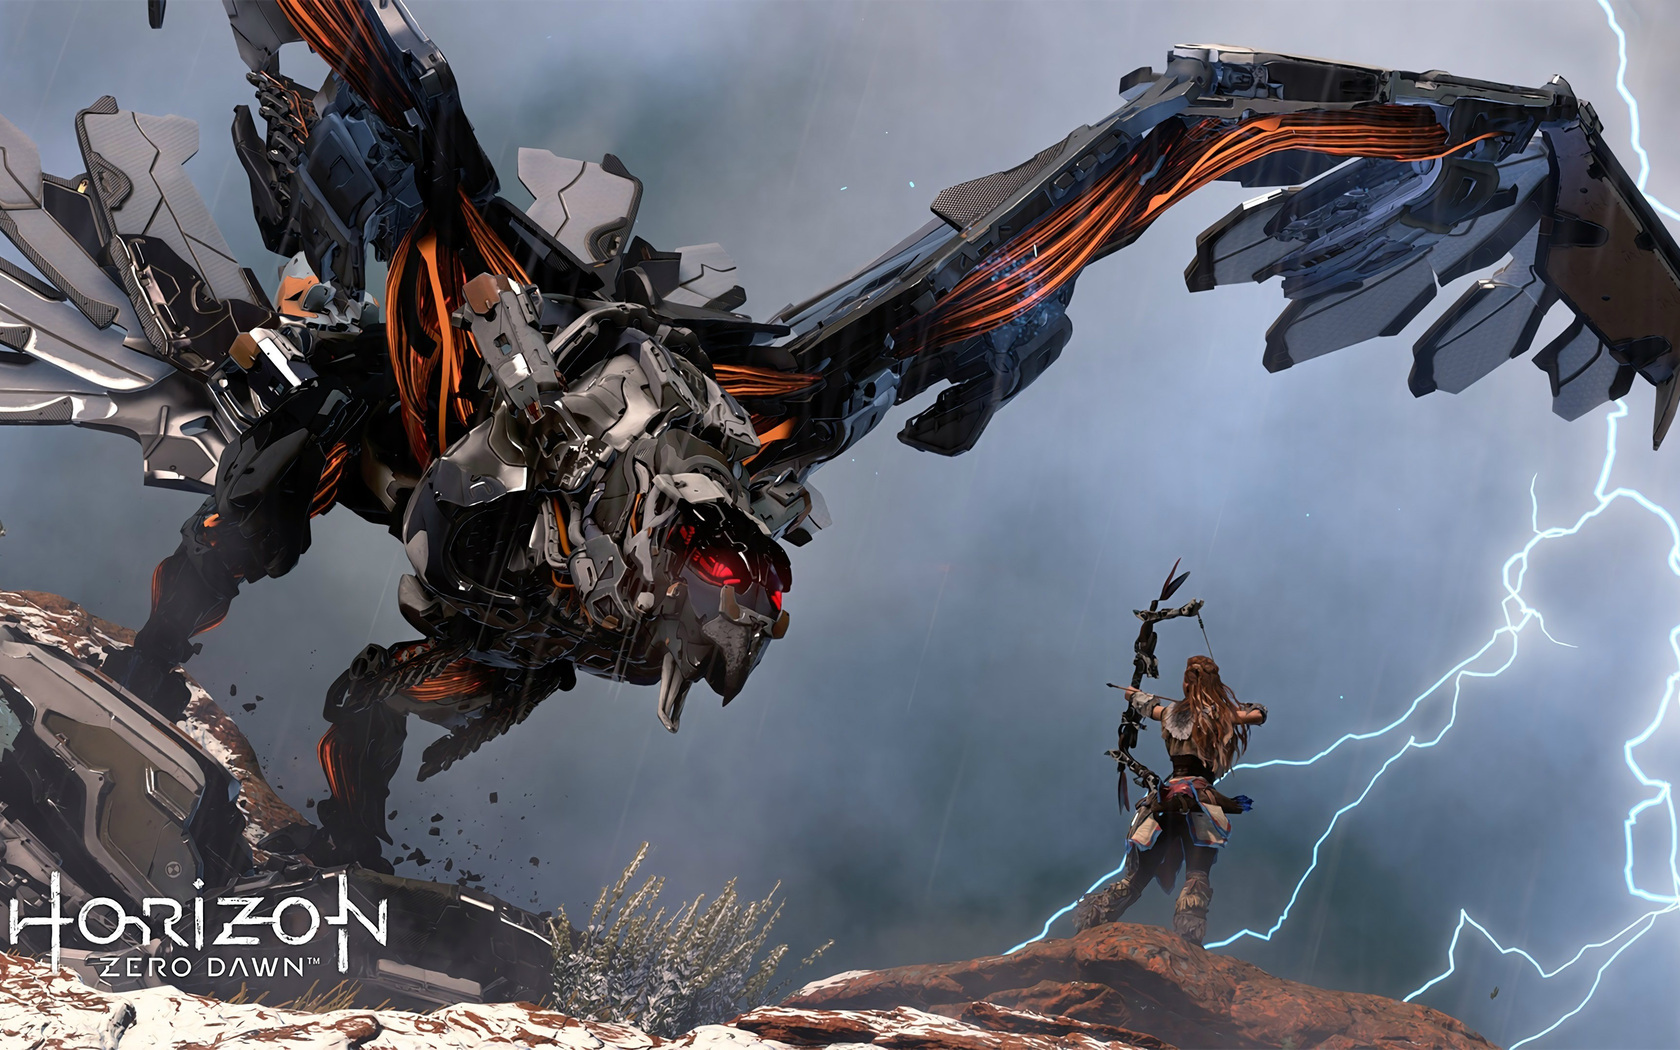 horizon-zero-dawn-video-game-pic.jpg